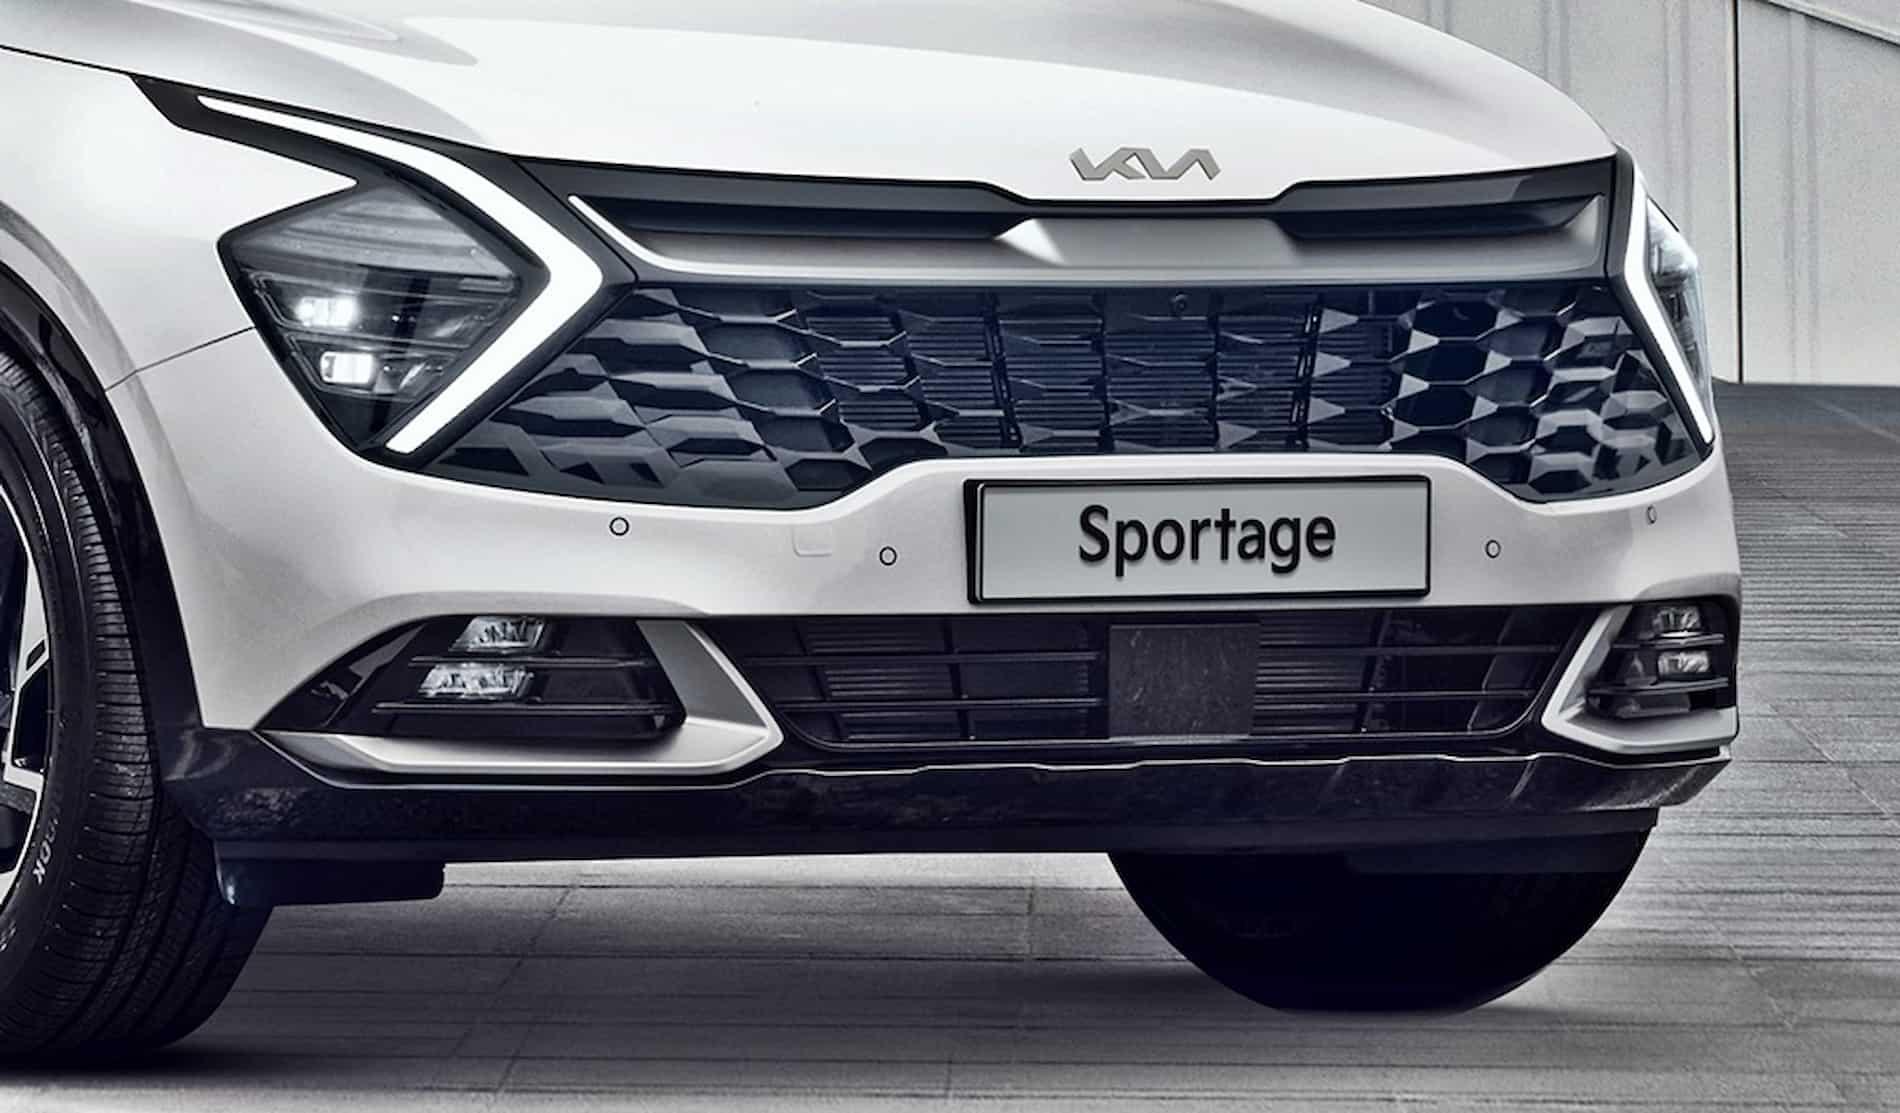 2021 Kia Sportage 5th generation 3